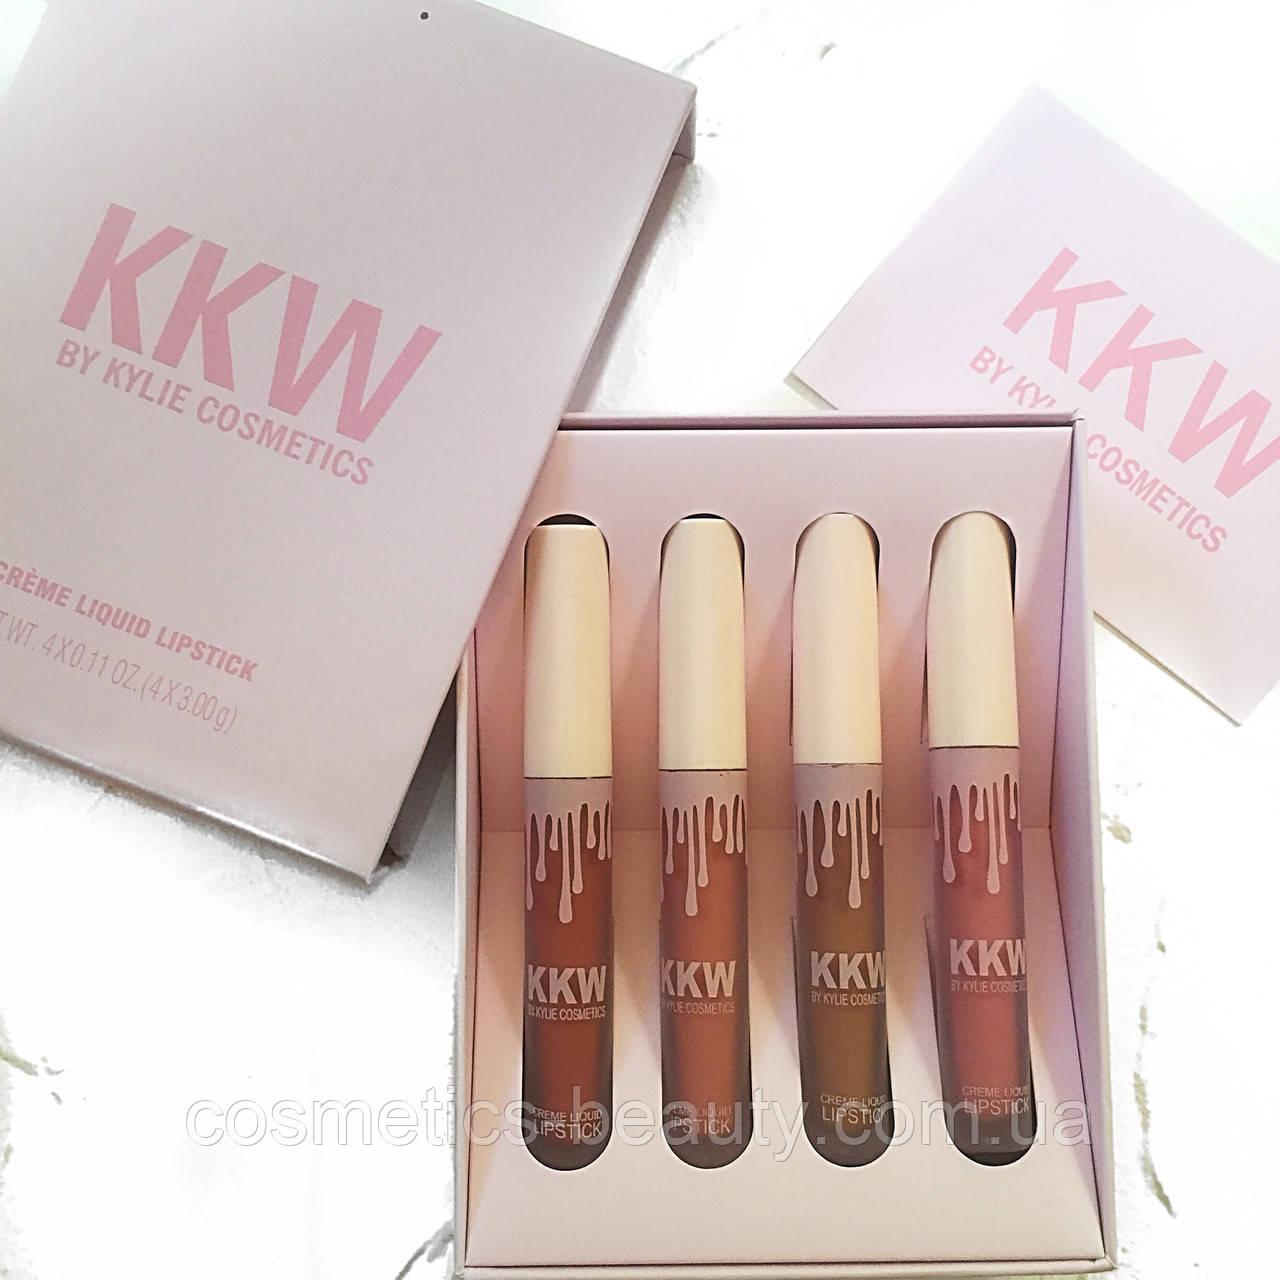 Набор матовых помад Kylie KKW Creme Liquid Lipstick 2 (4 шт.)(реплика).